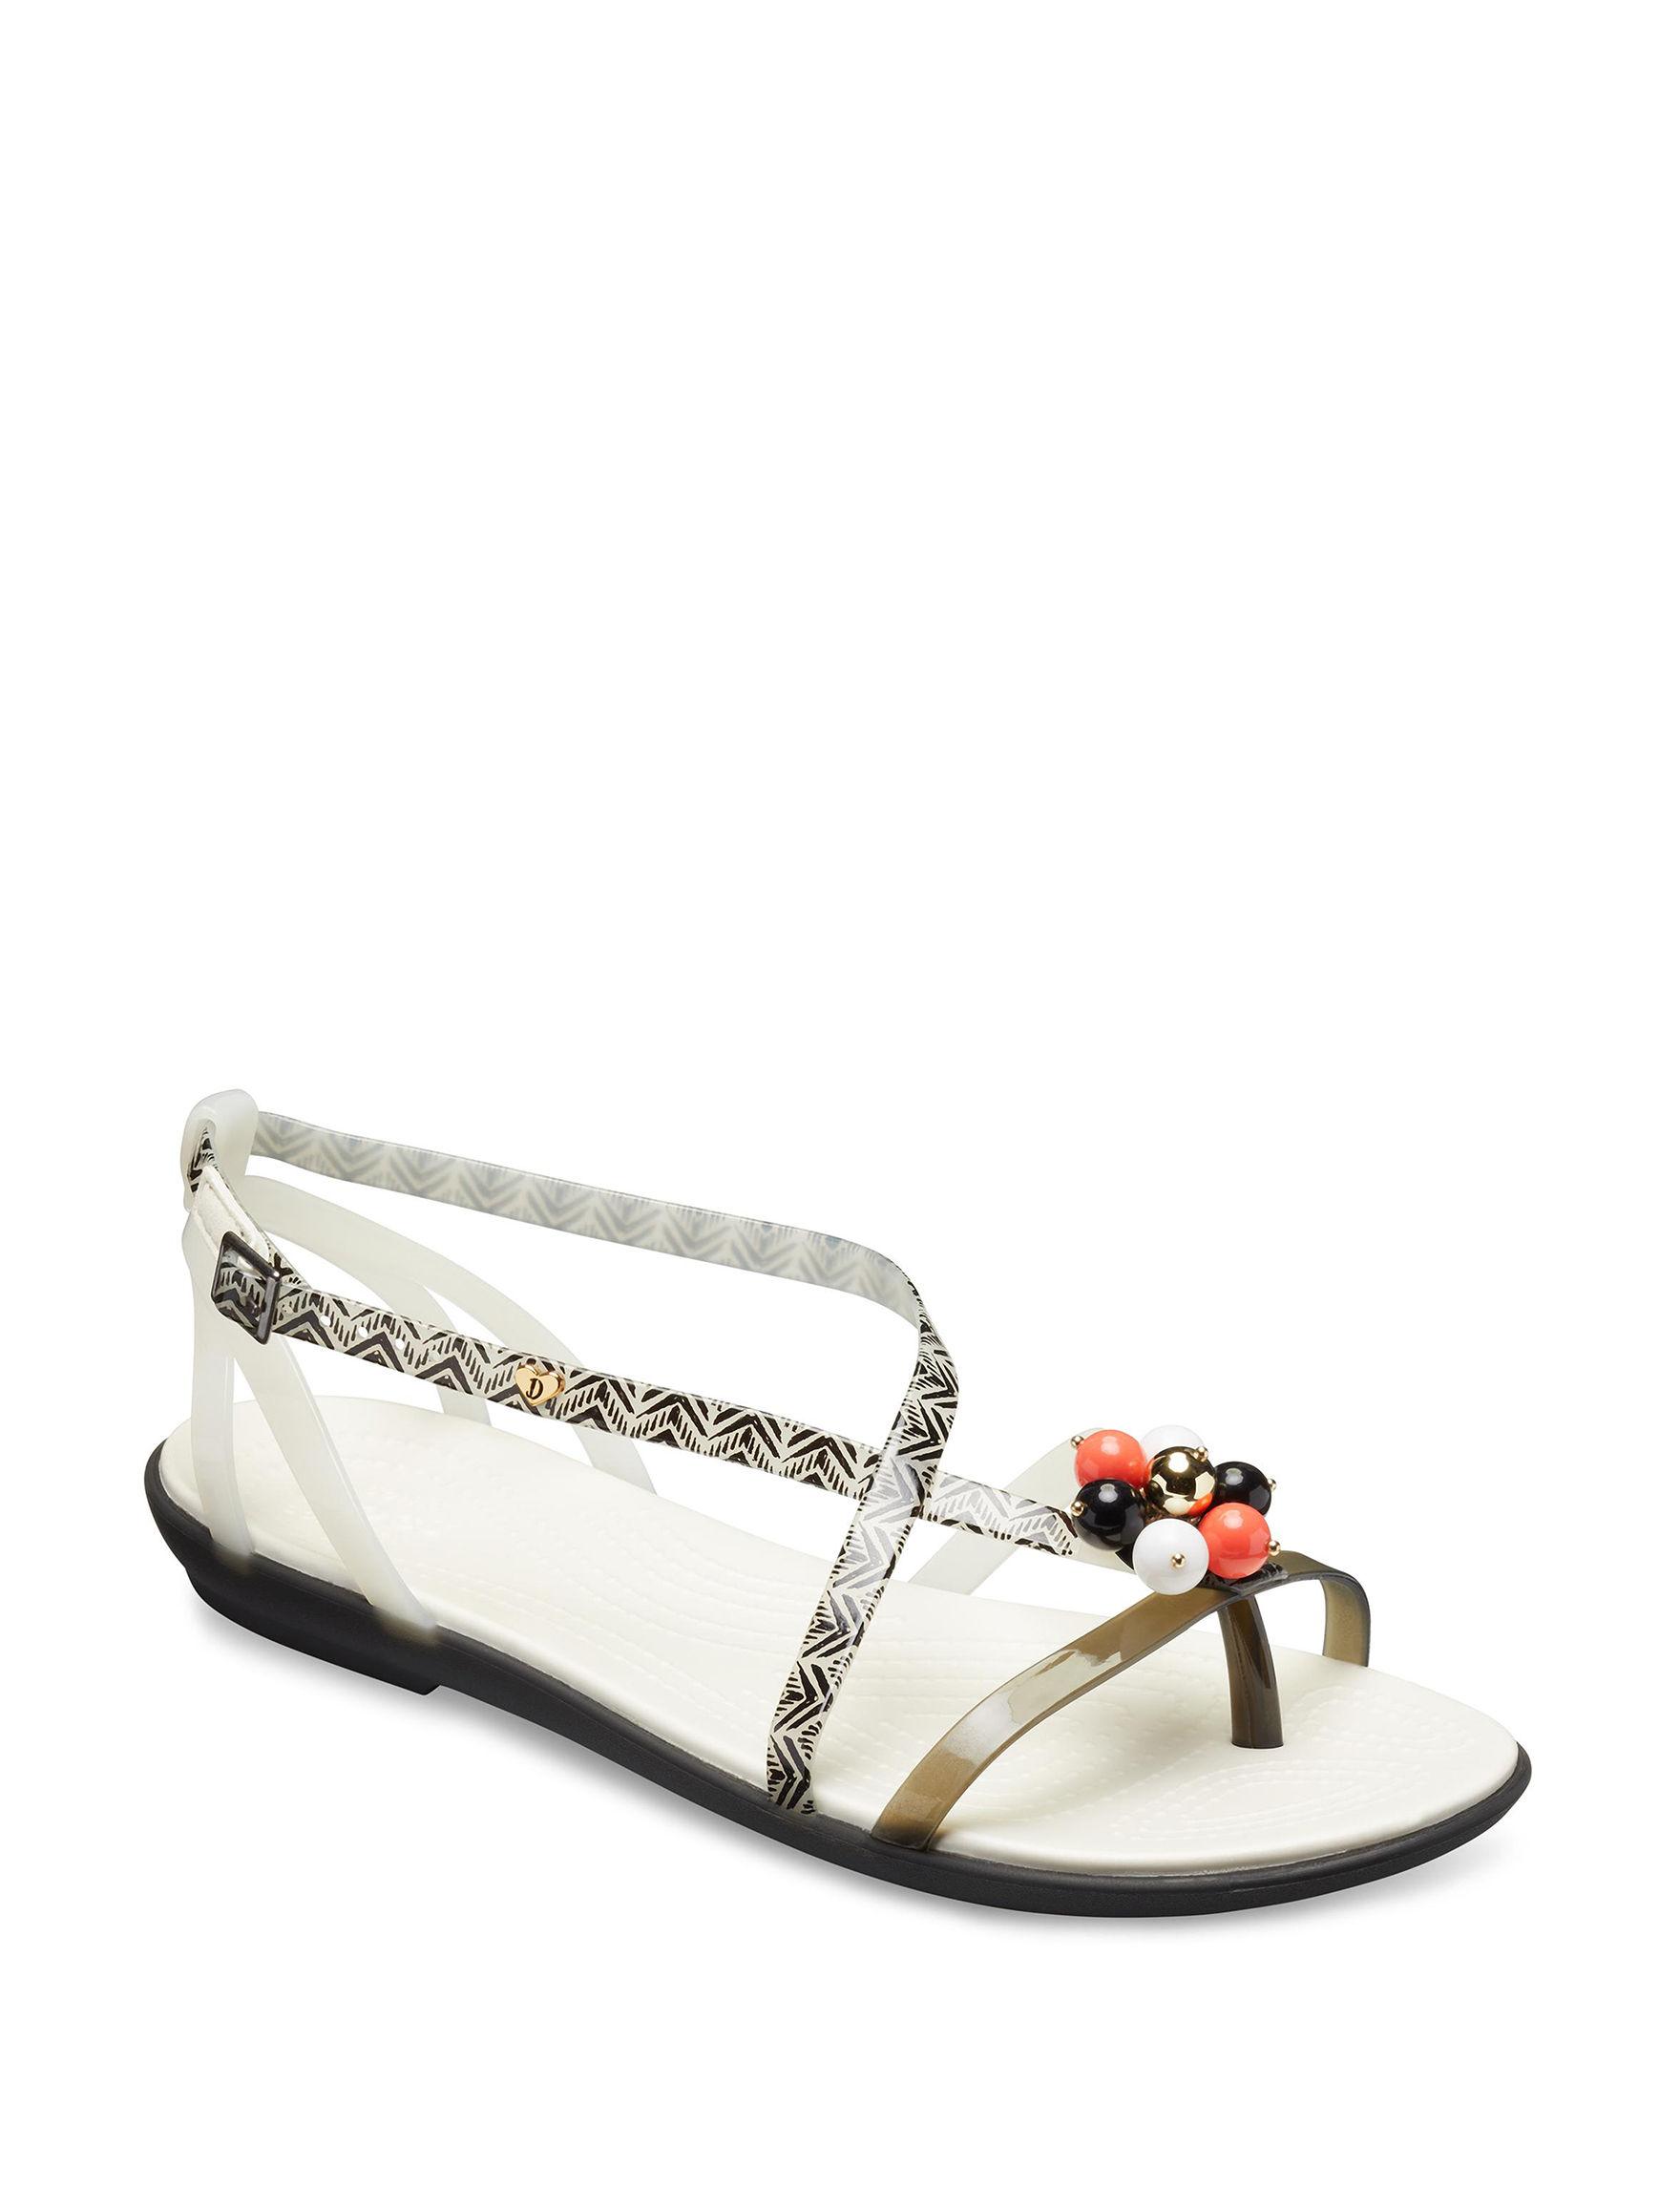 Crocs White Comfort